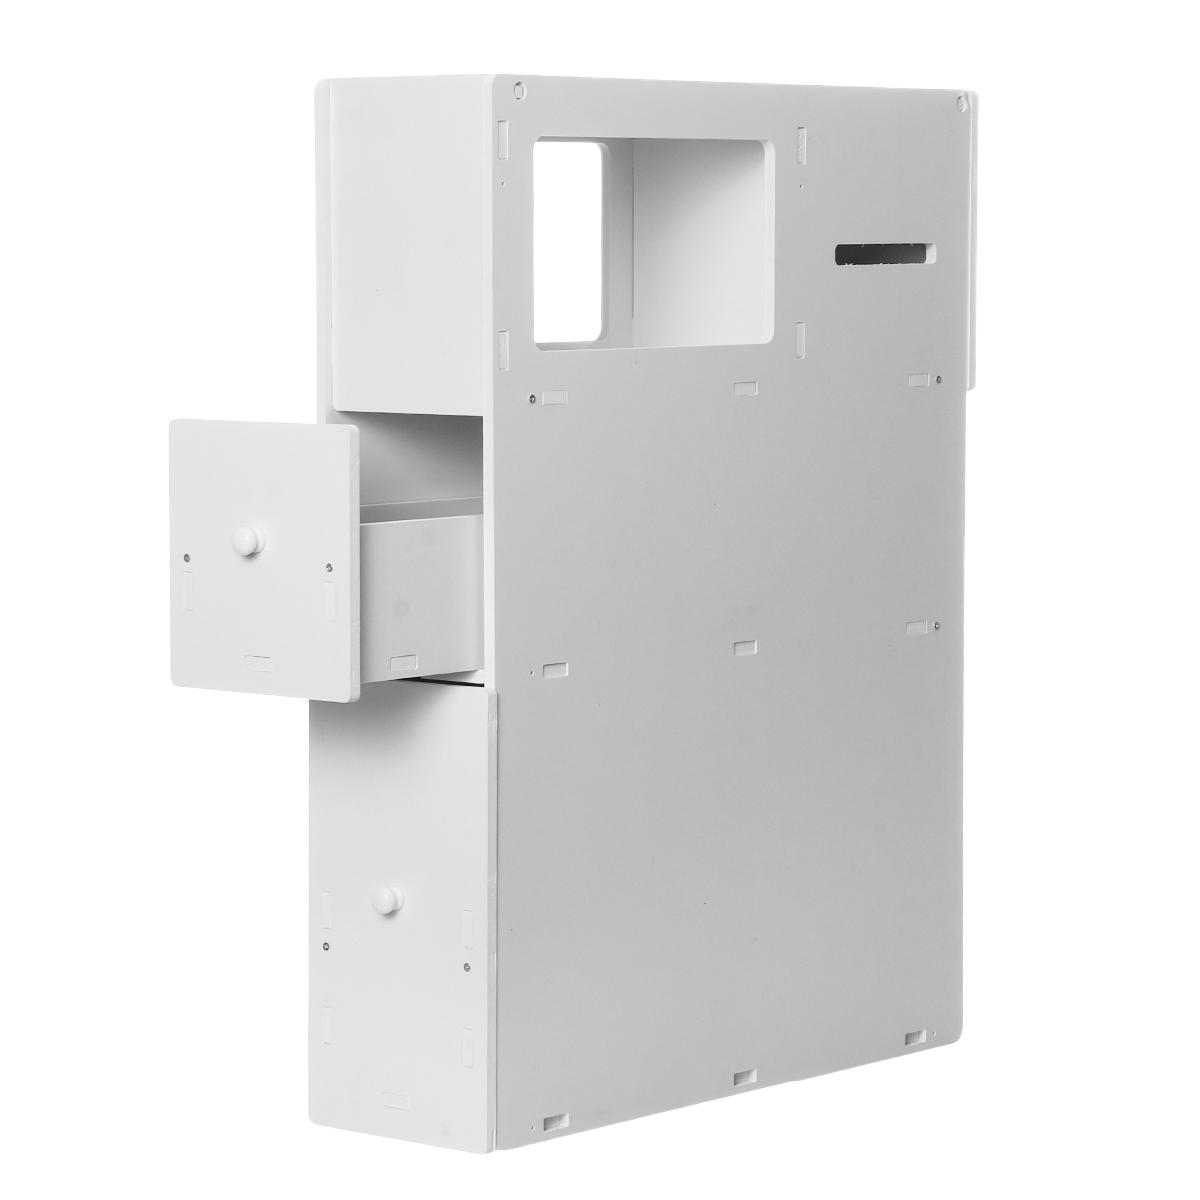 Bathroom Storage Toilet Cabinet Caddy Holder Drawer Wheels ...